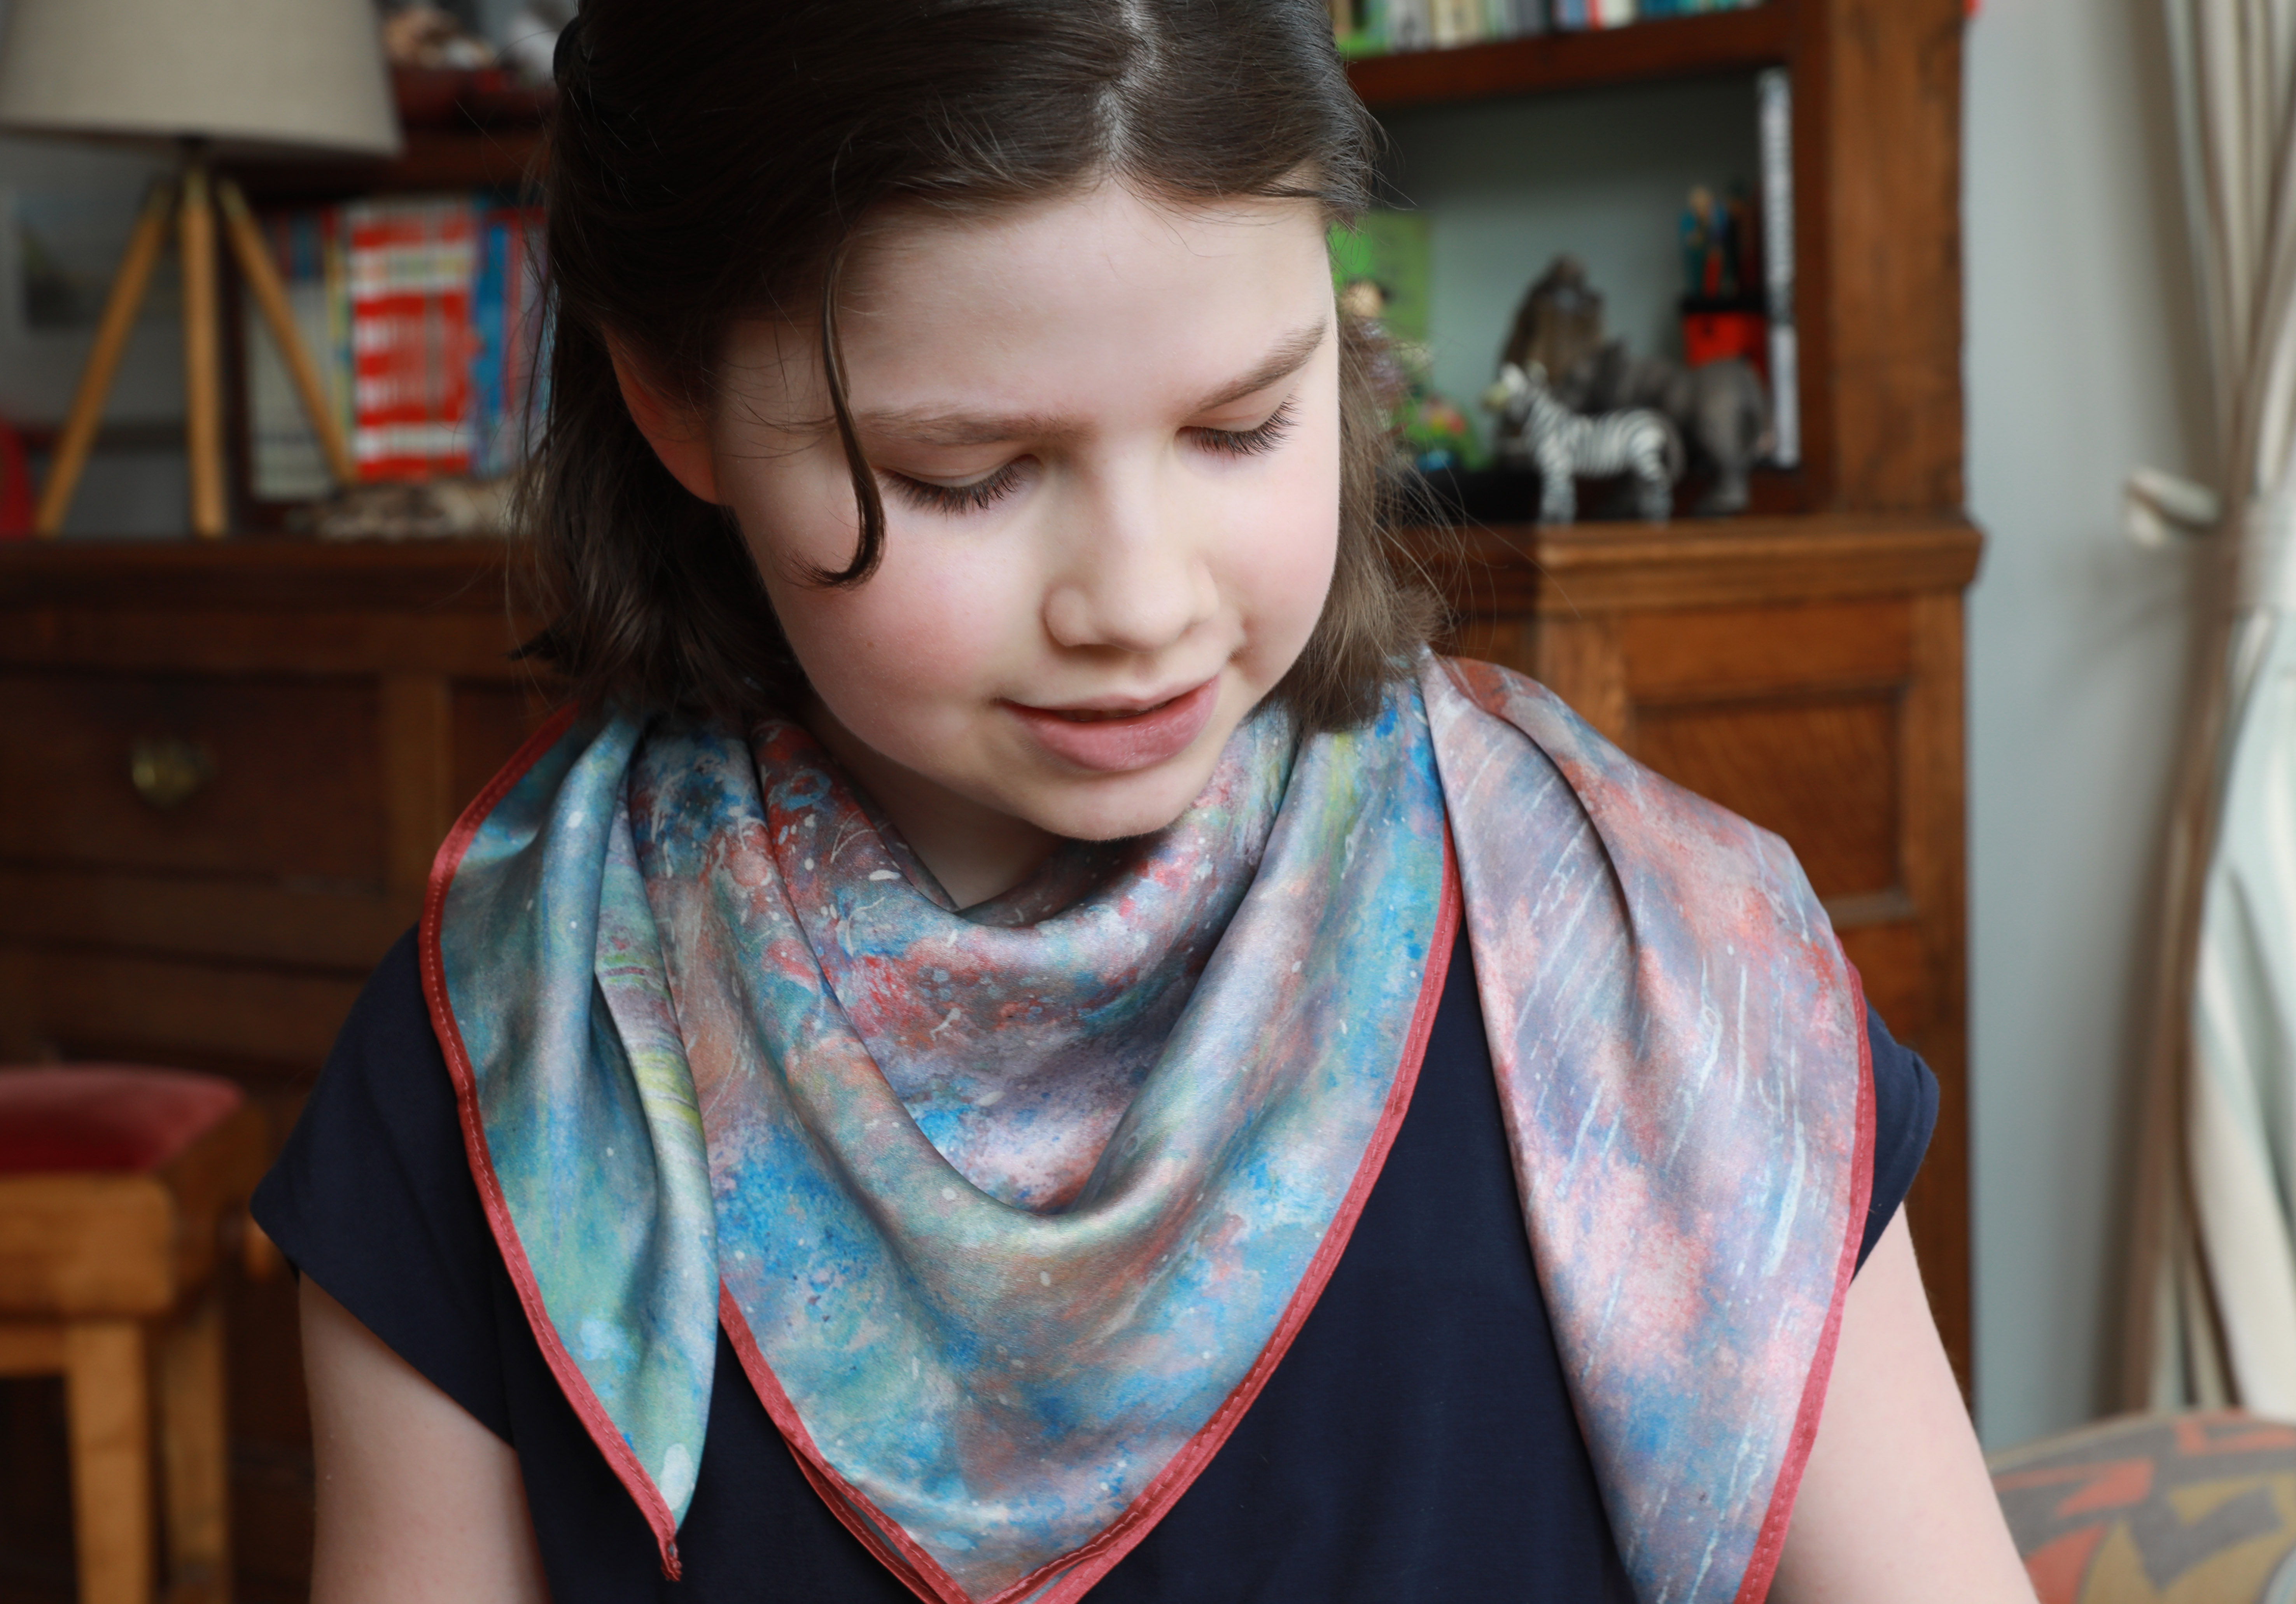 Anima silk scarf worn by Iris